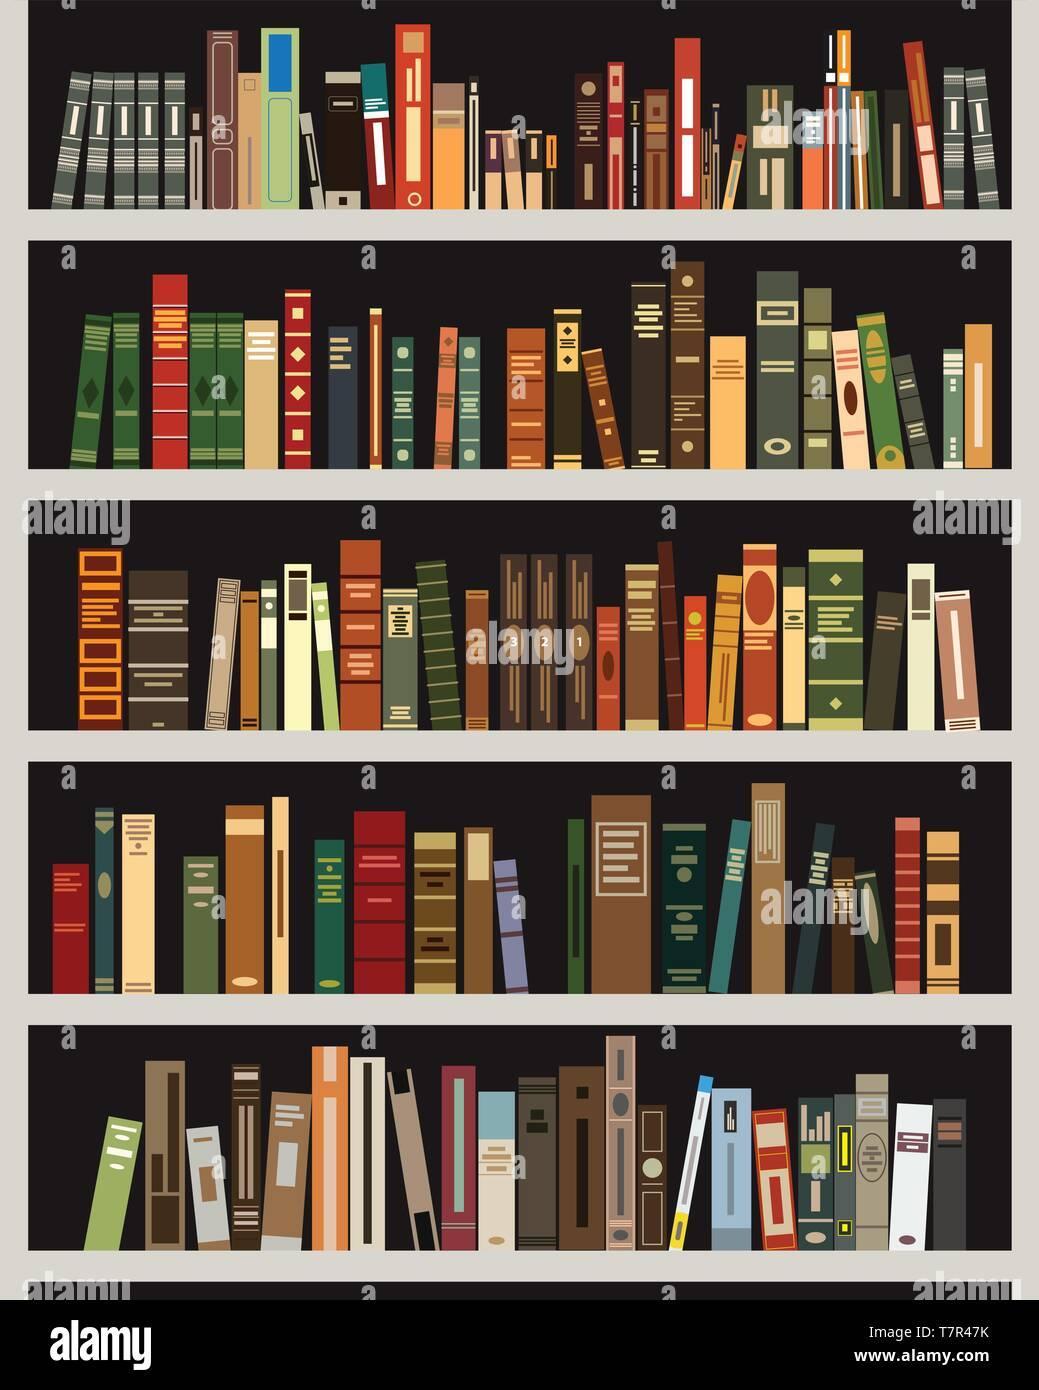 bookshelf vector illustration alamy